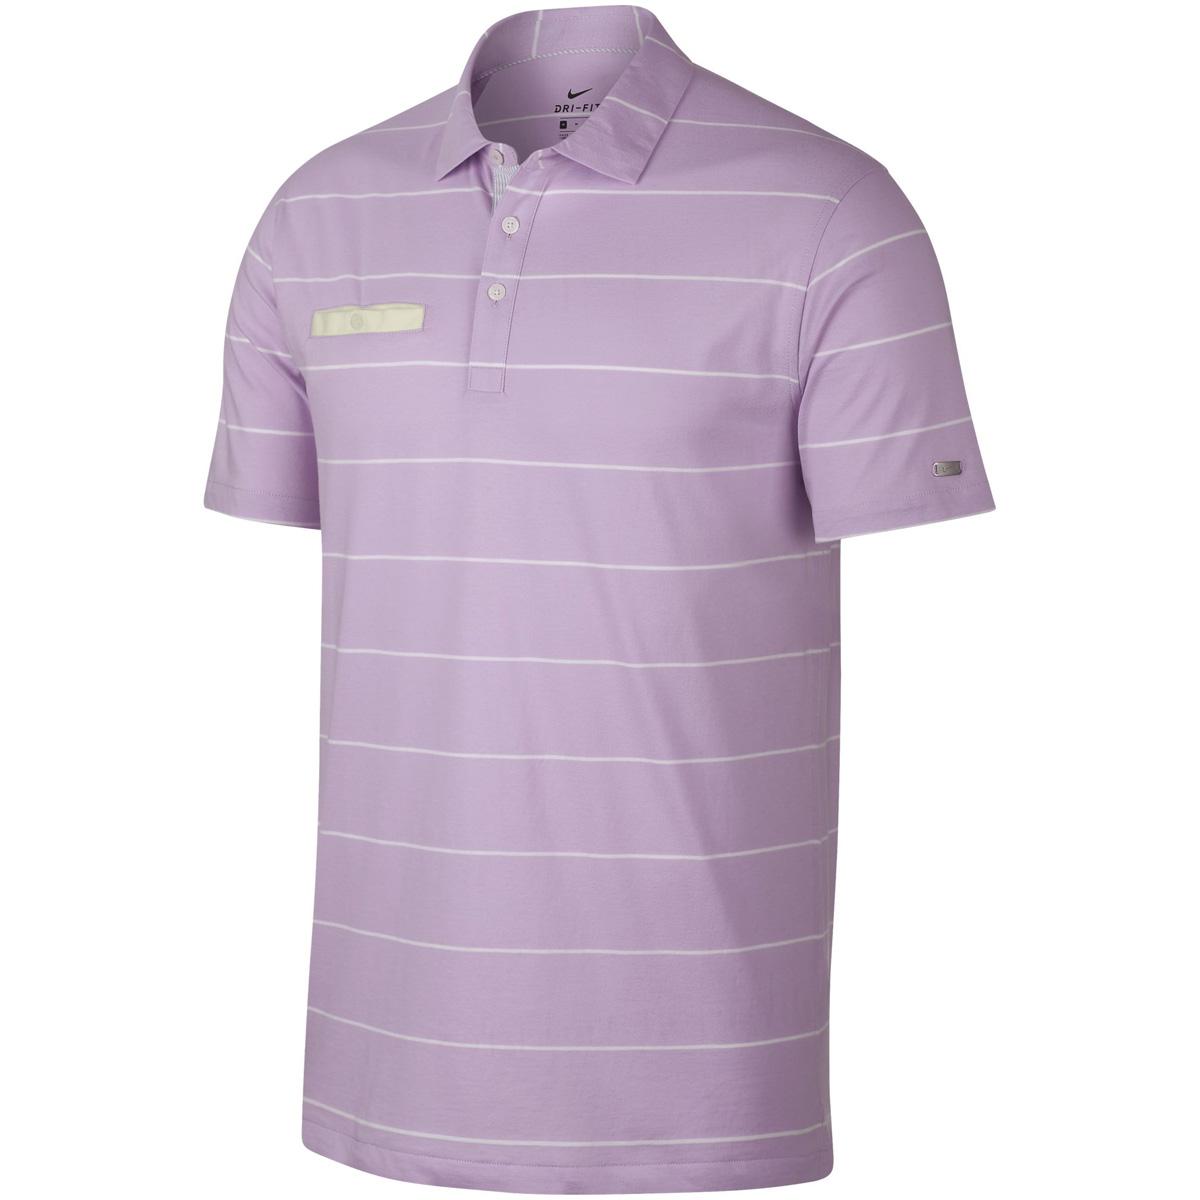 DRI-FIT レガシー ストライプ 半袖ポロシャツ